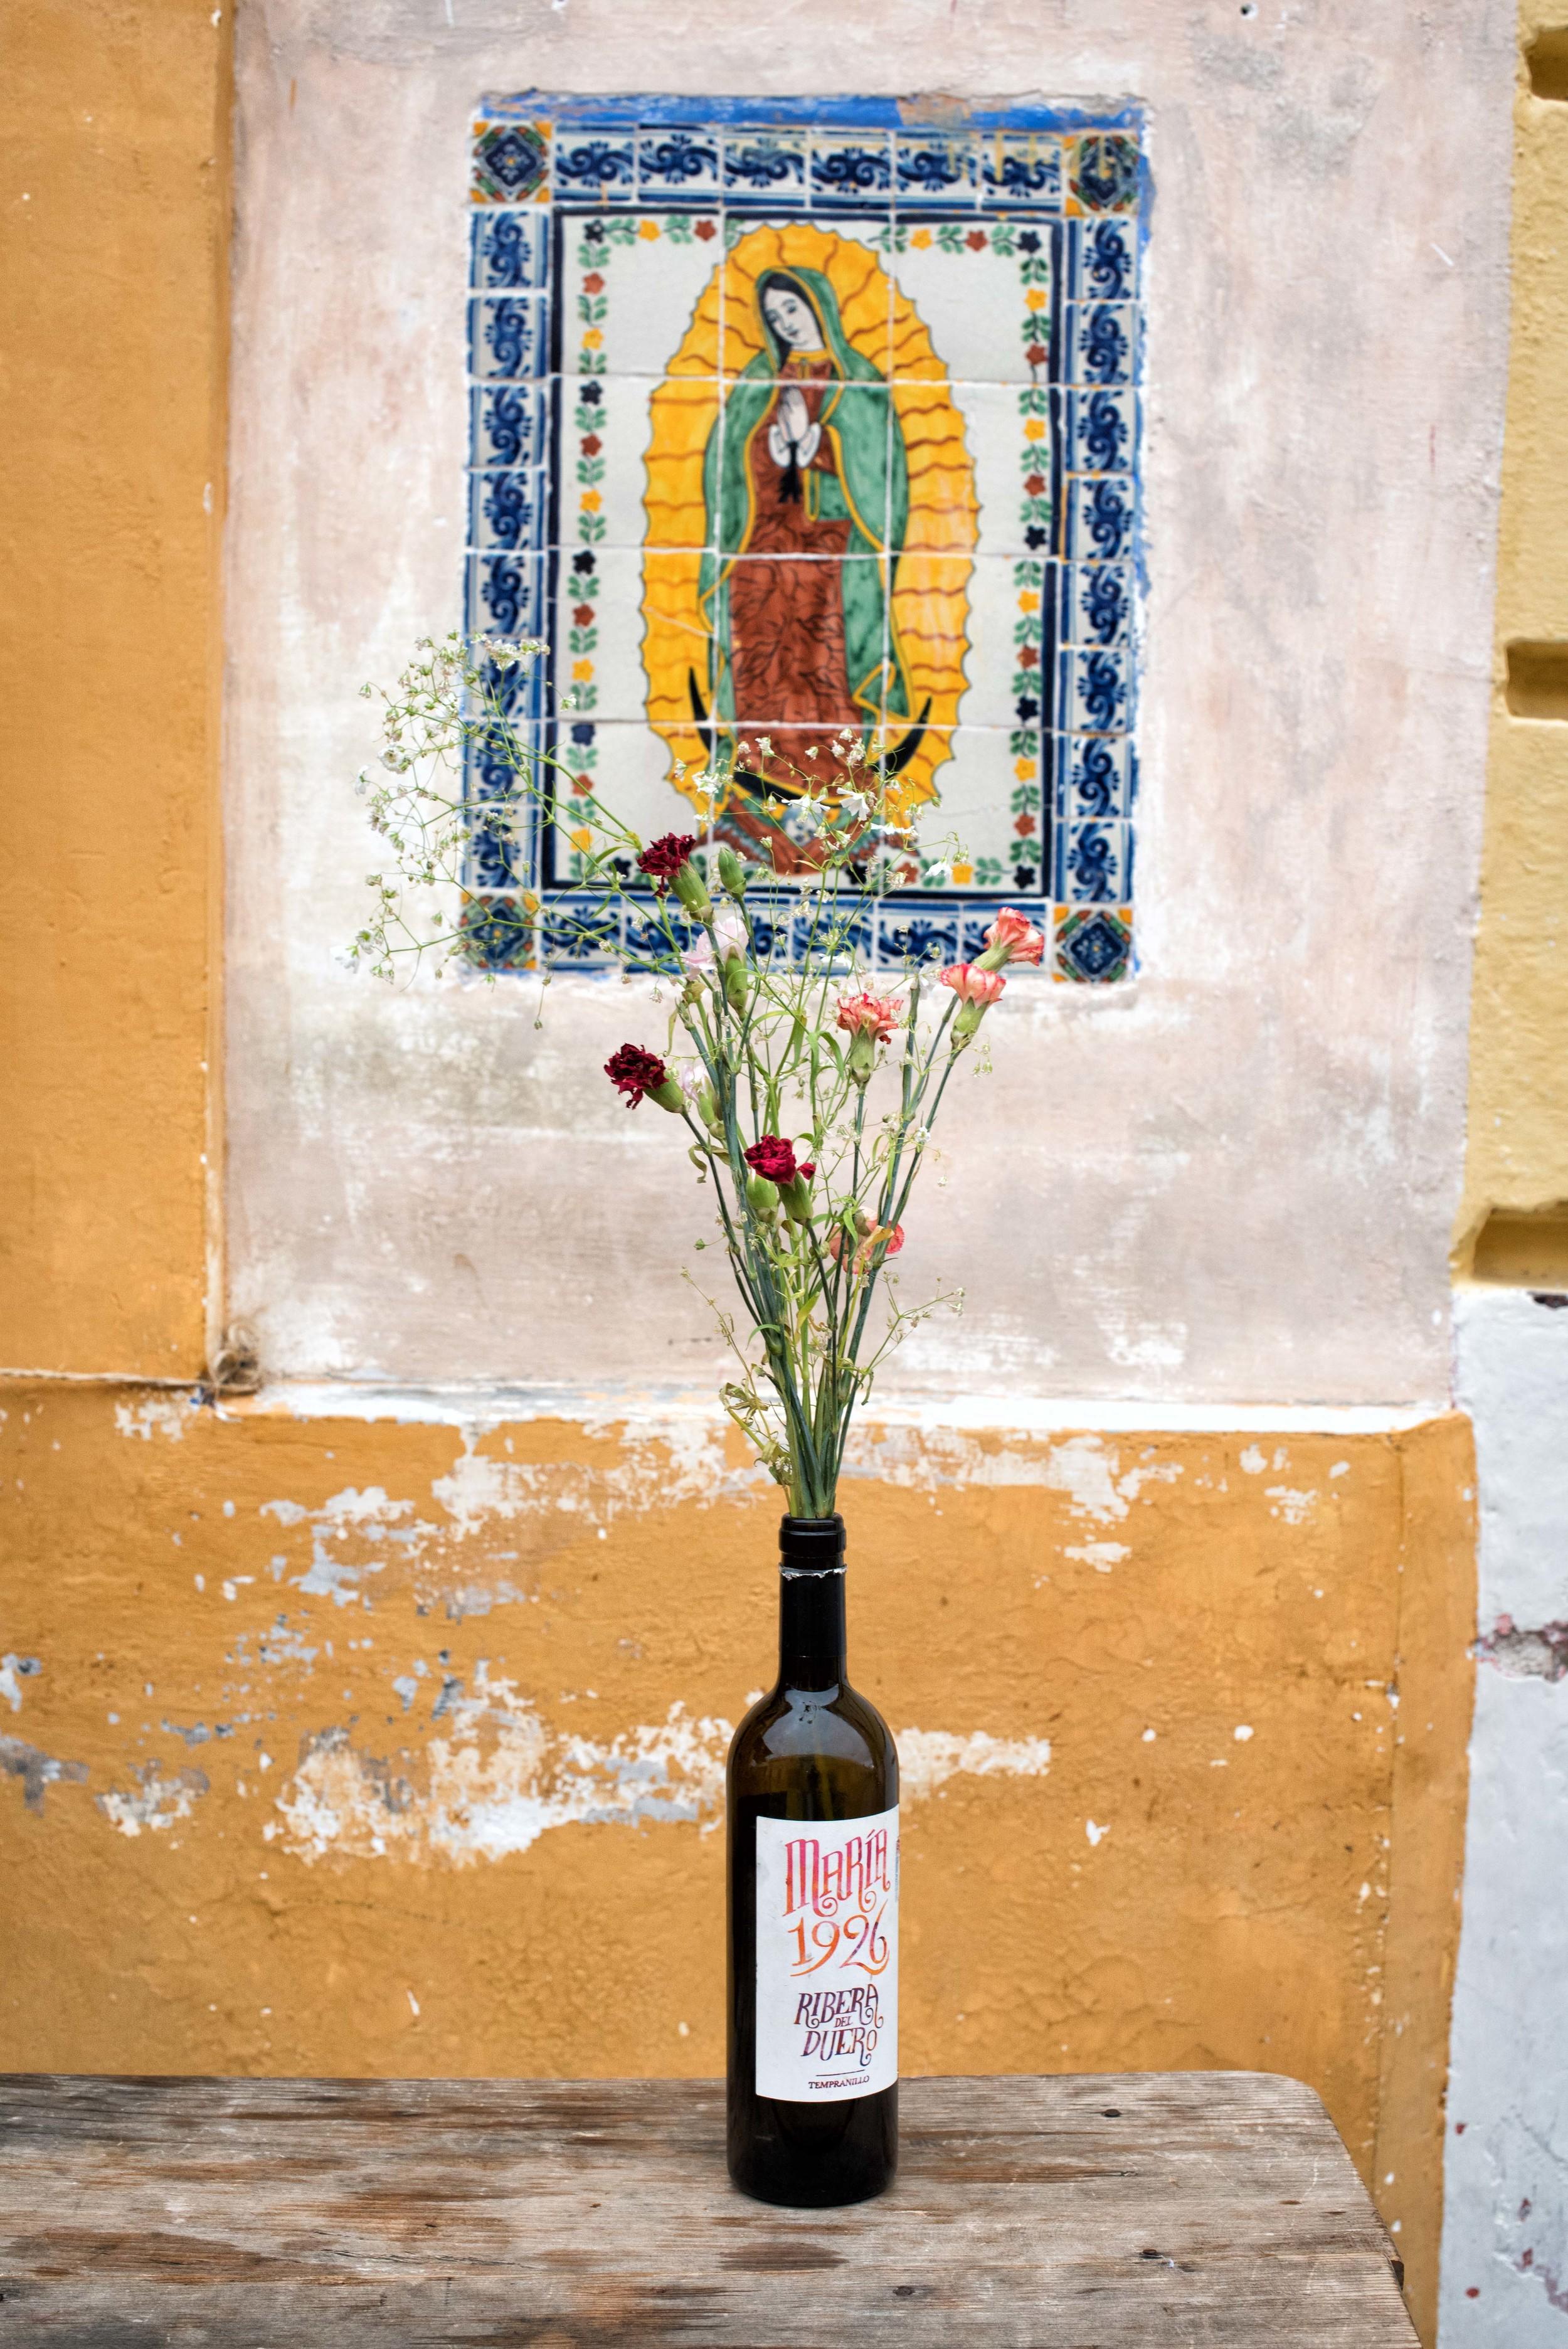 San Cristobal de las Casas, details